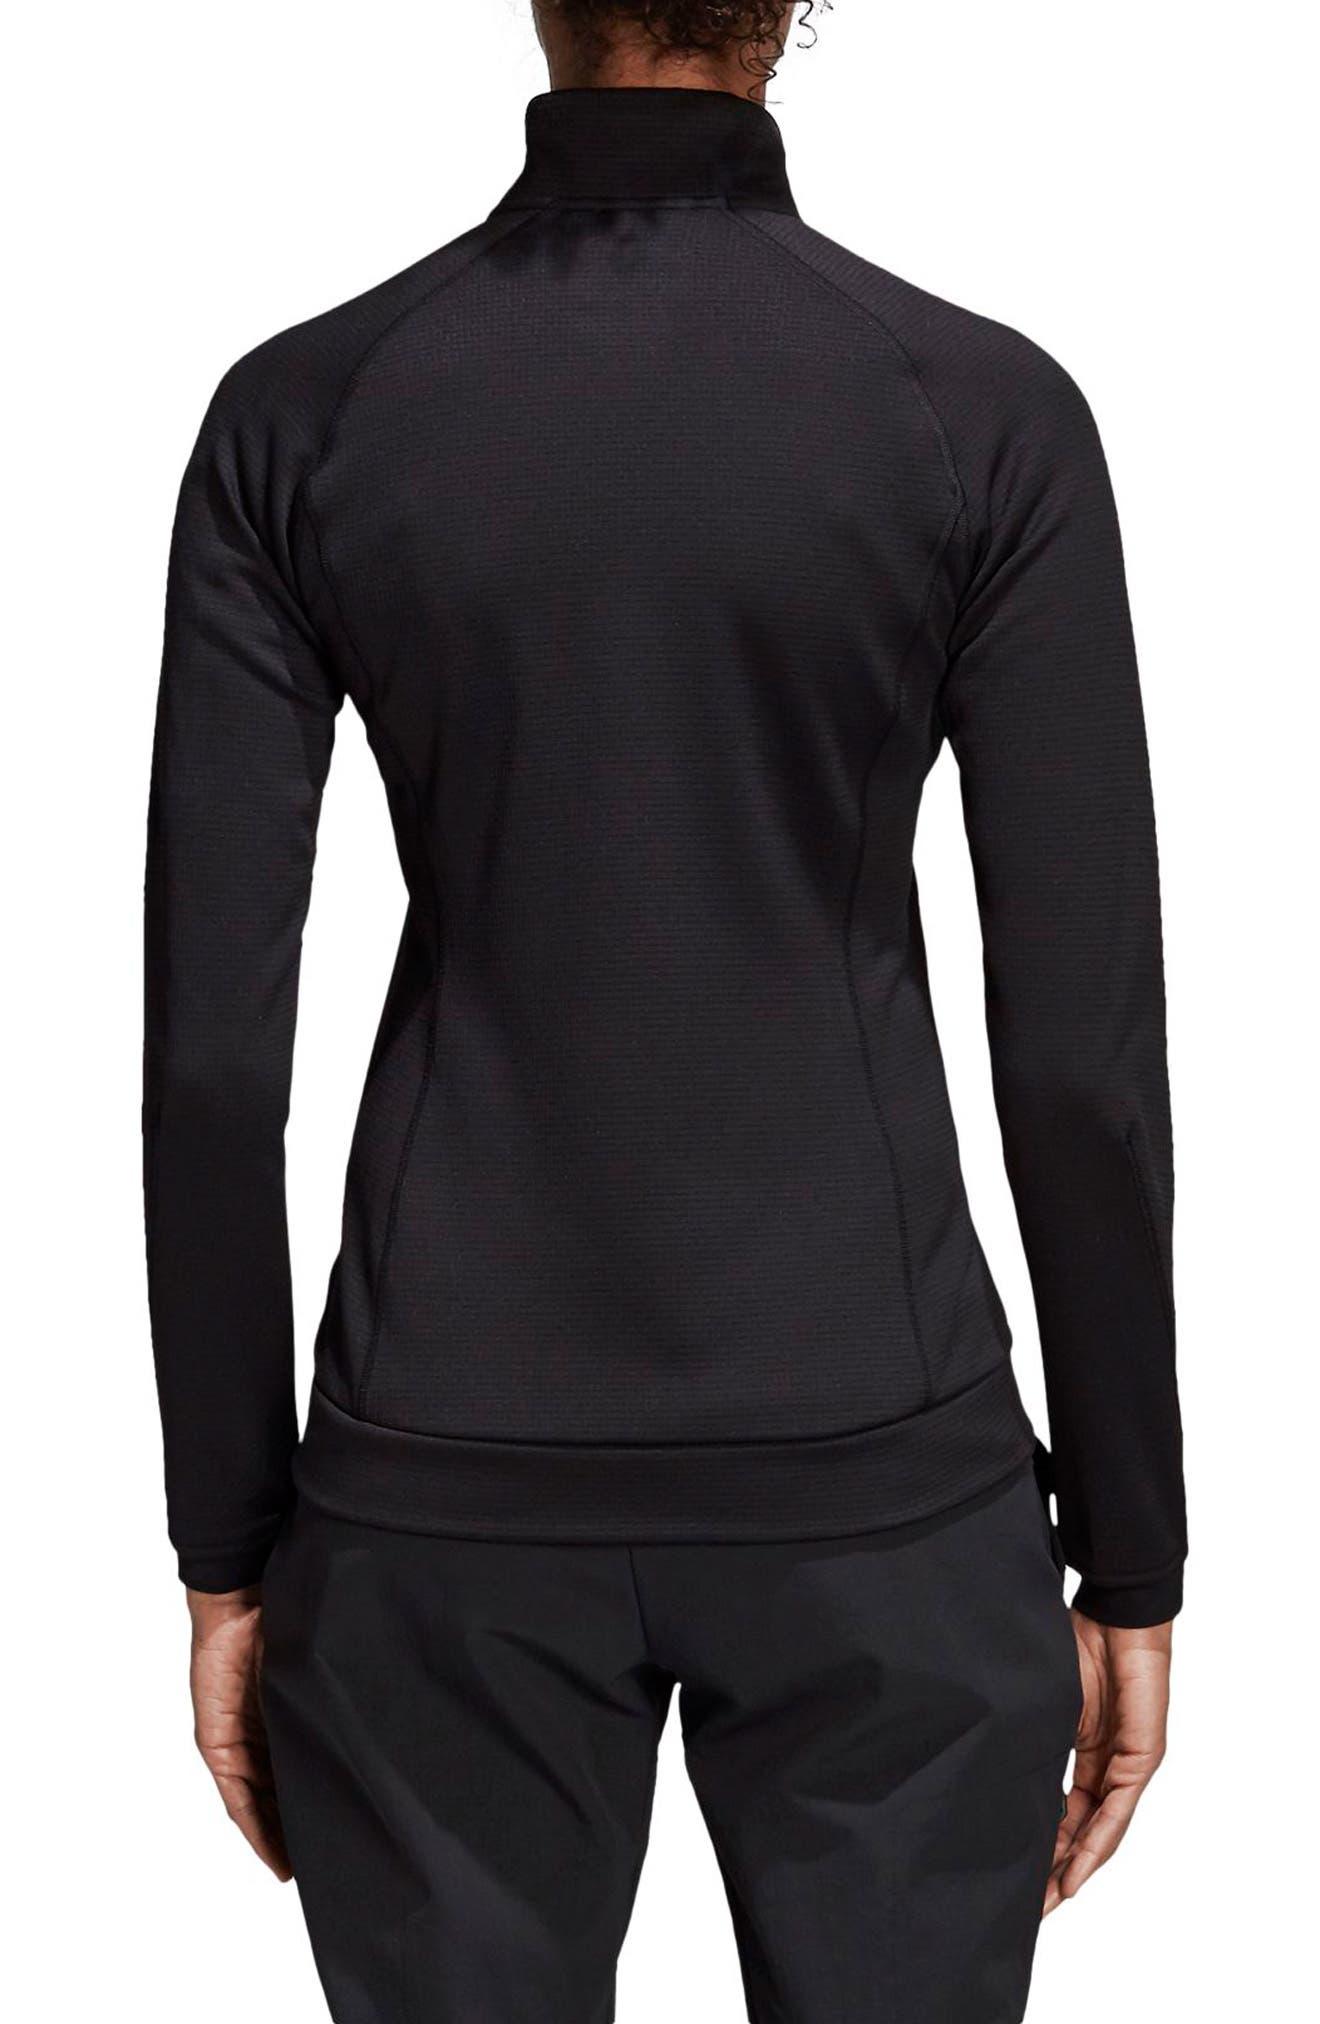 ADIDAS, Stockhorn Fleece Jacket, Alternate thumbnail 2, color, BLACK